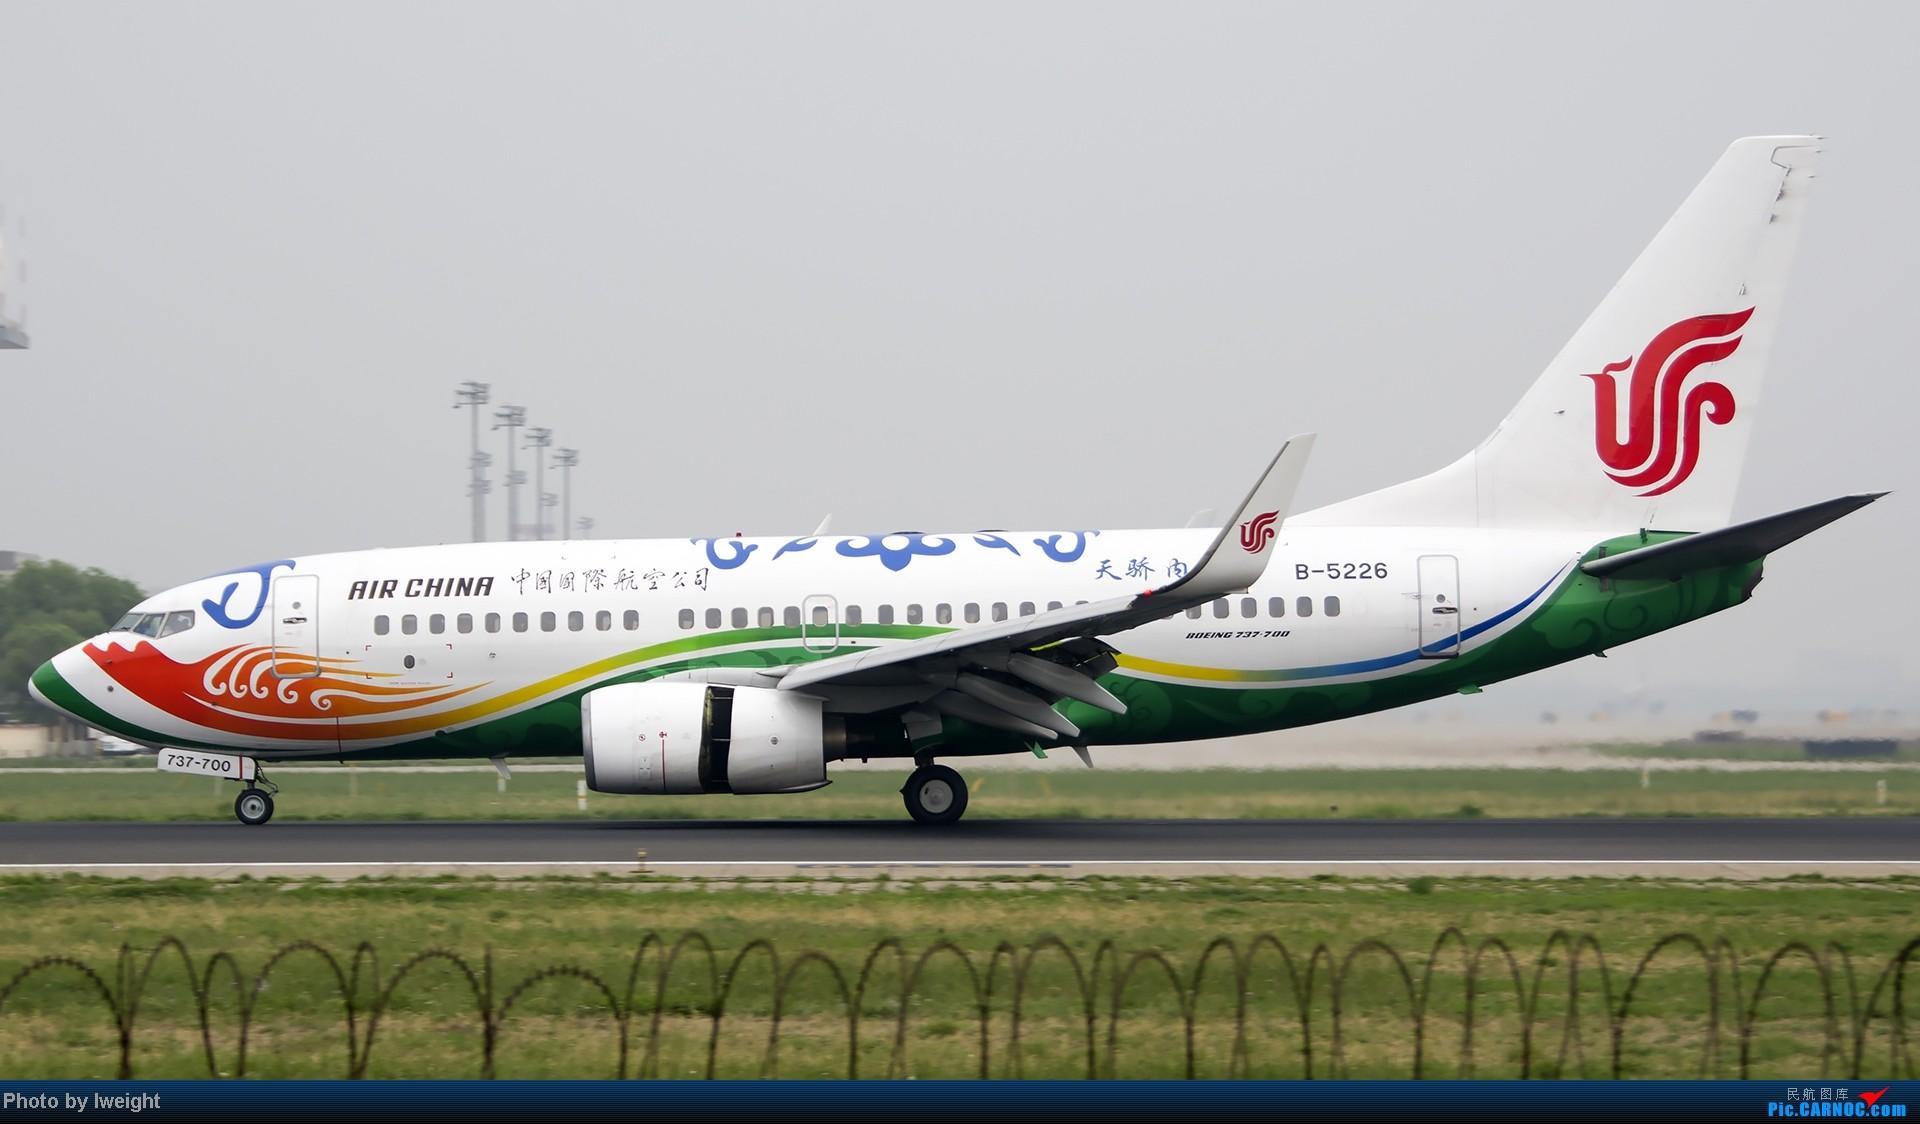 Re:[原创]休假无聊,跑道边来拍机玩(晚点的ZestAir、换装的B6100和刚交付的B2738等) BOEING 737-700 B-5226 中国北京首都机场